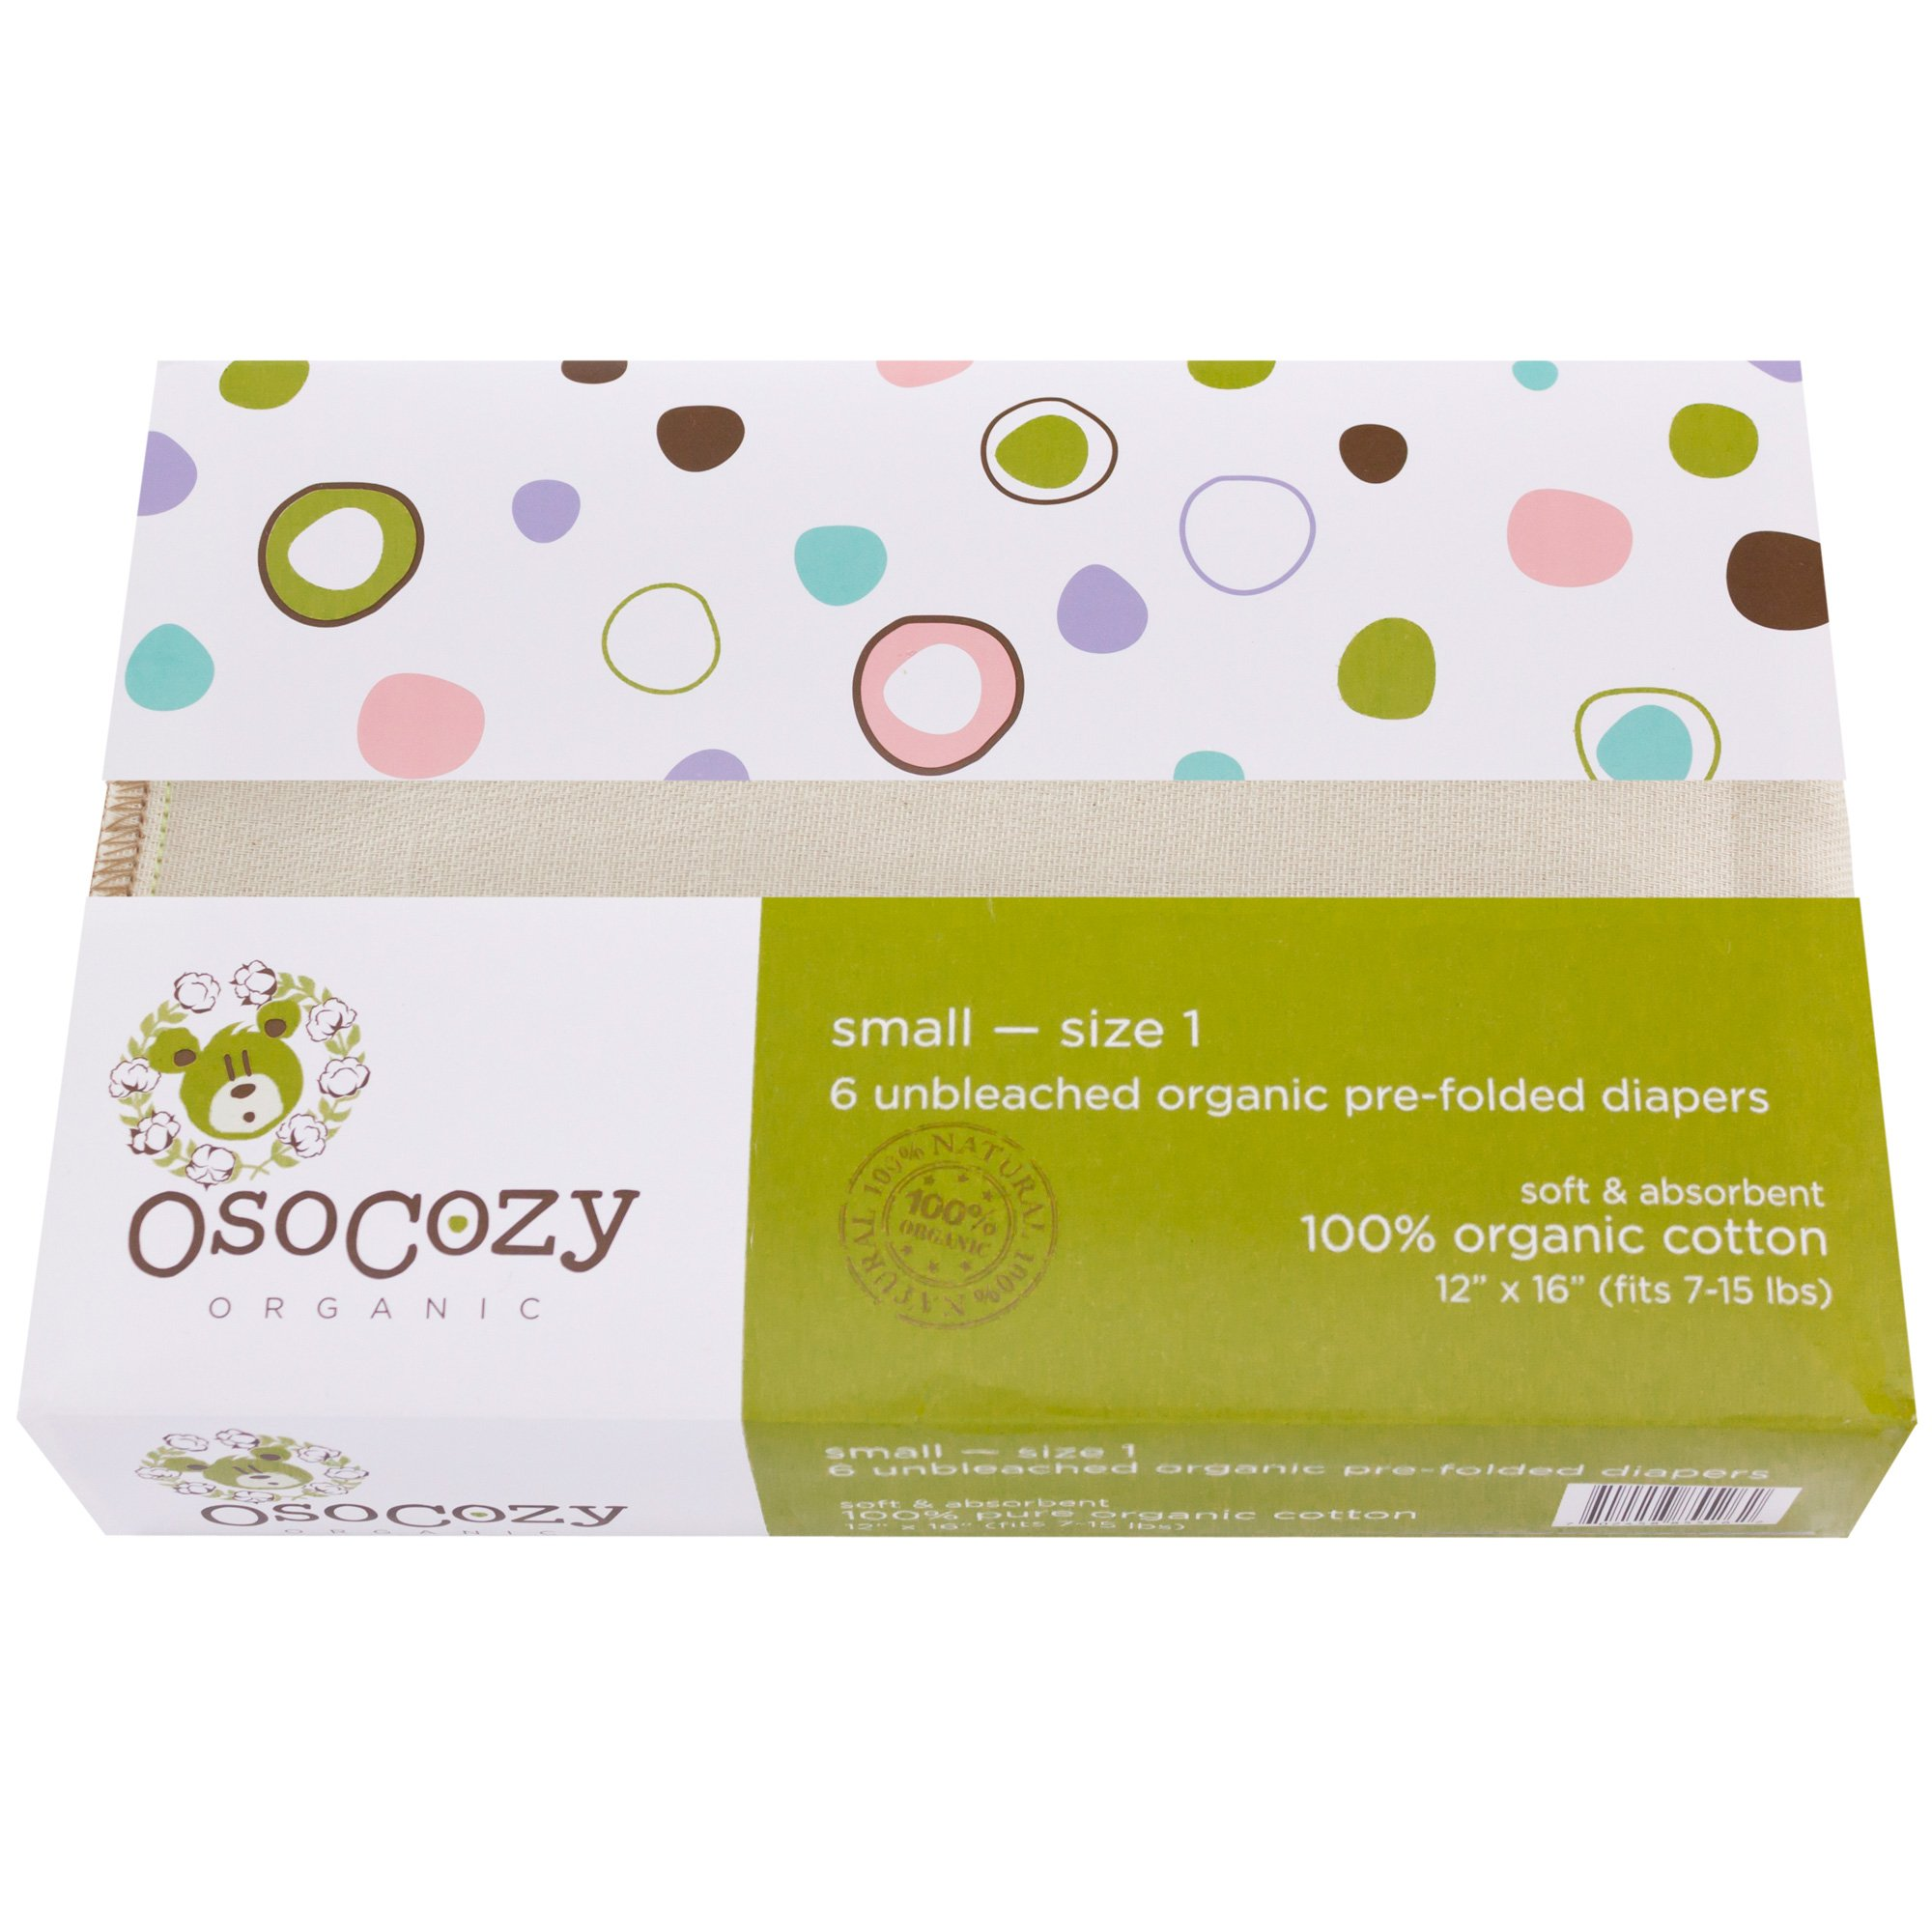 OsoCozy Organic Cotton Prefolds Traditional Fit Small 4x8x4 (6pk) - Fits 7-15 lbs